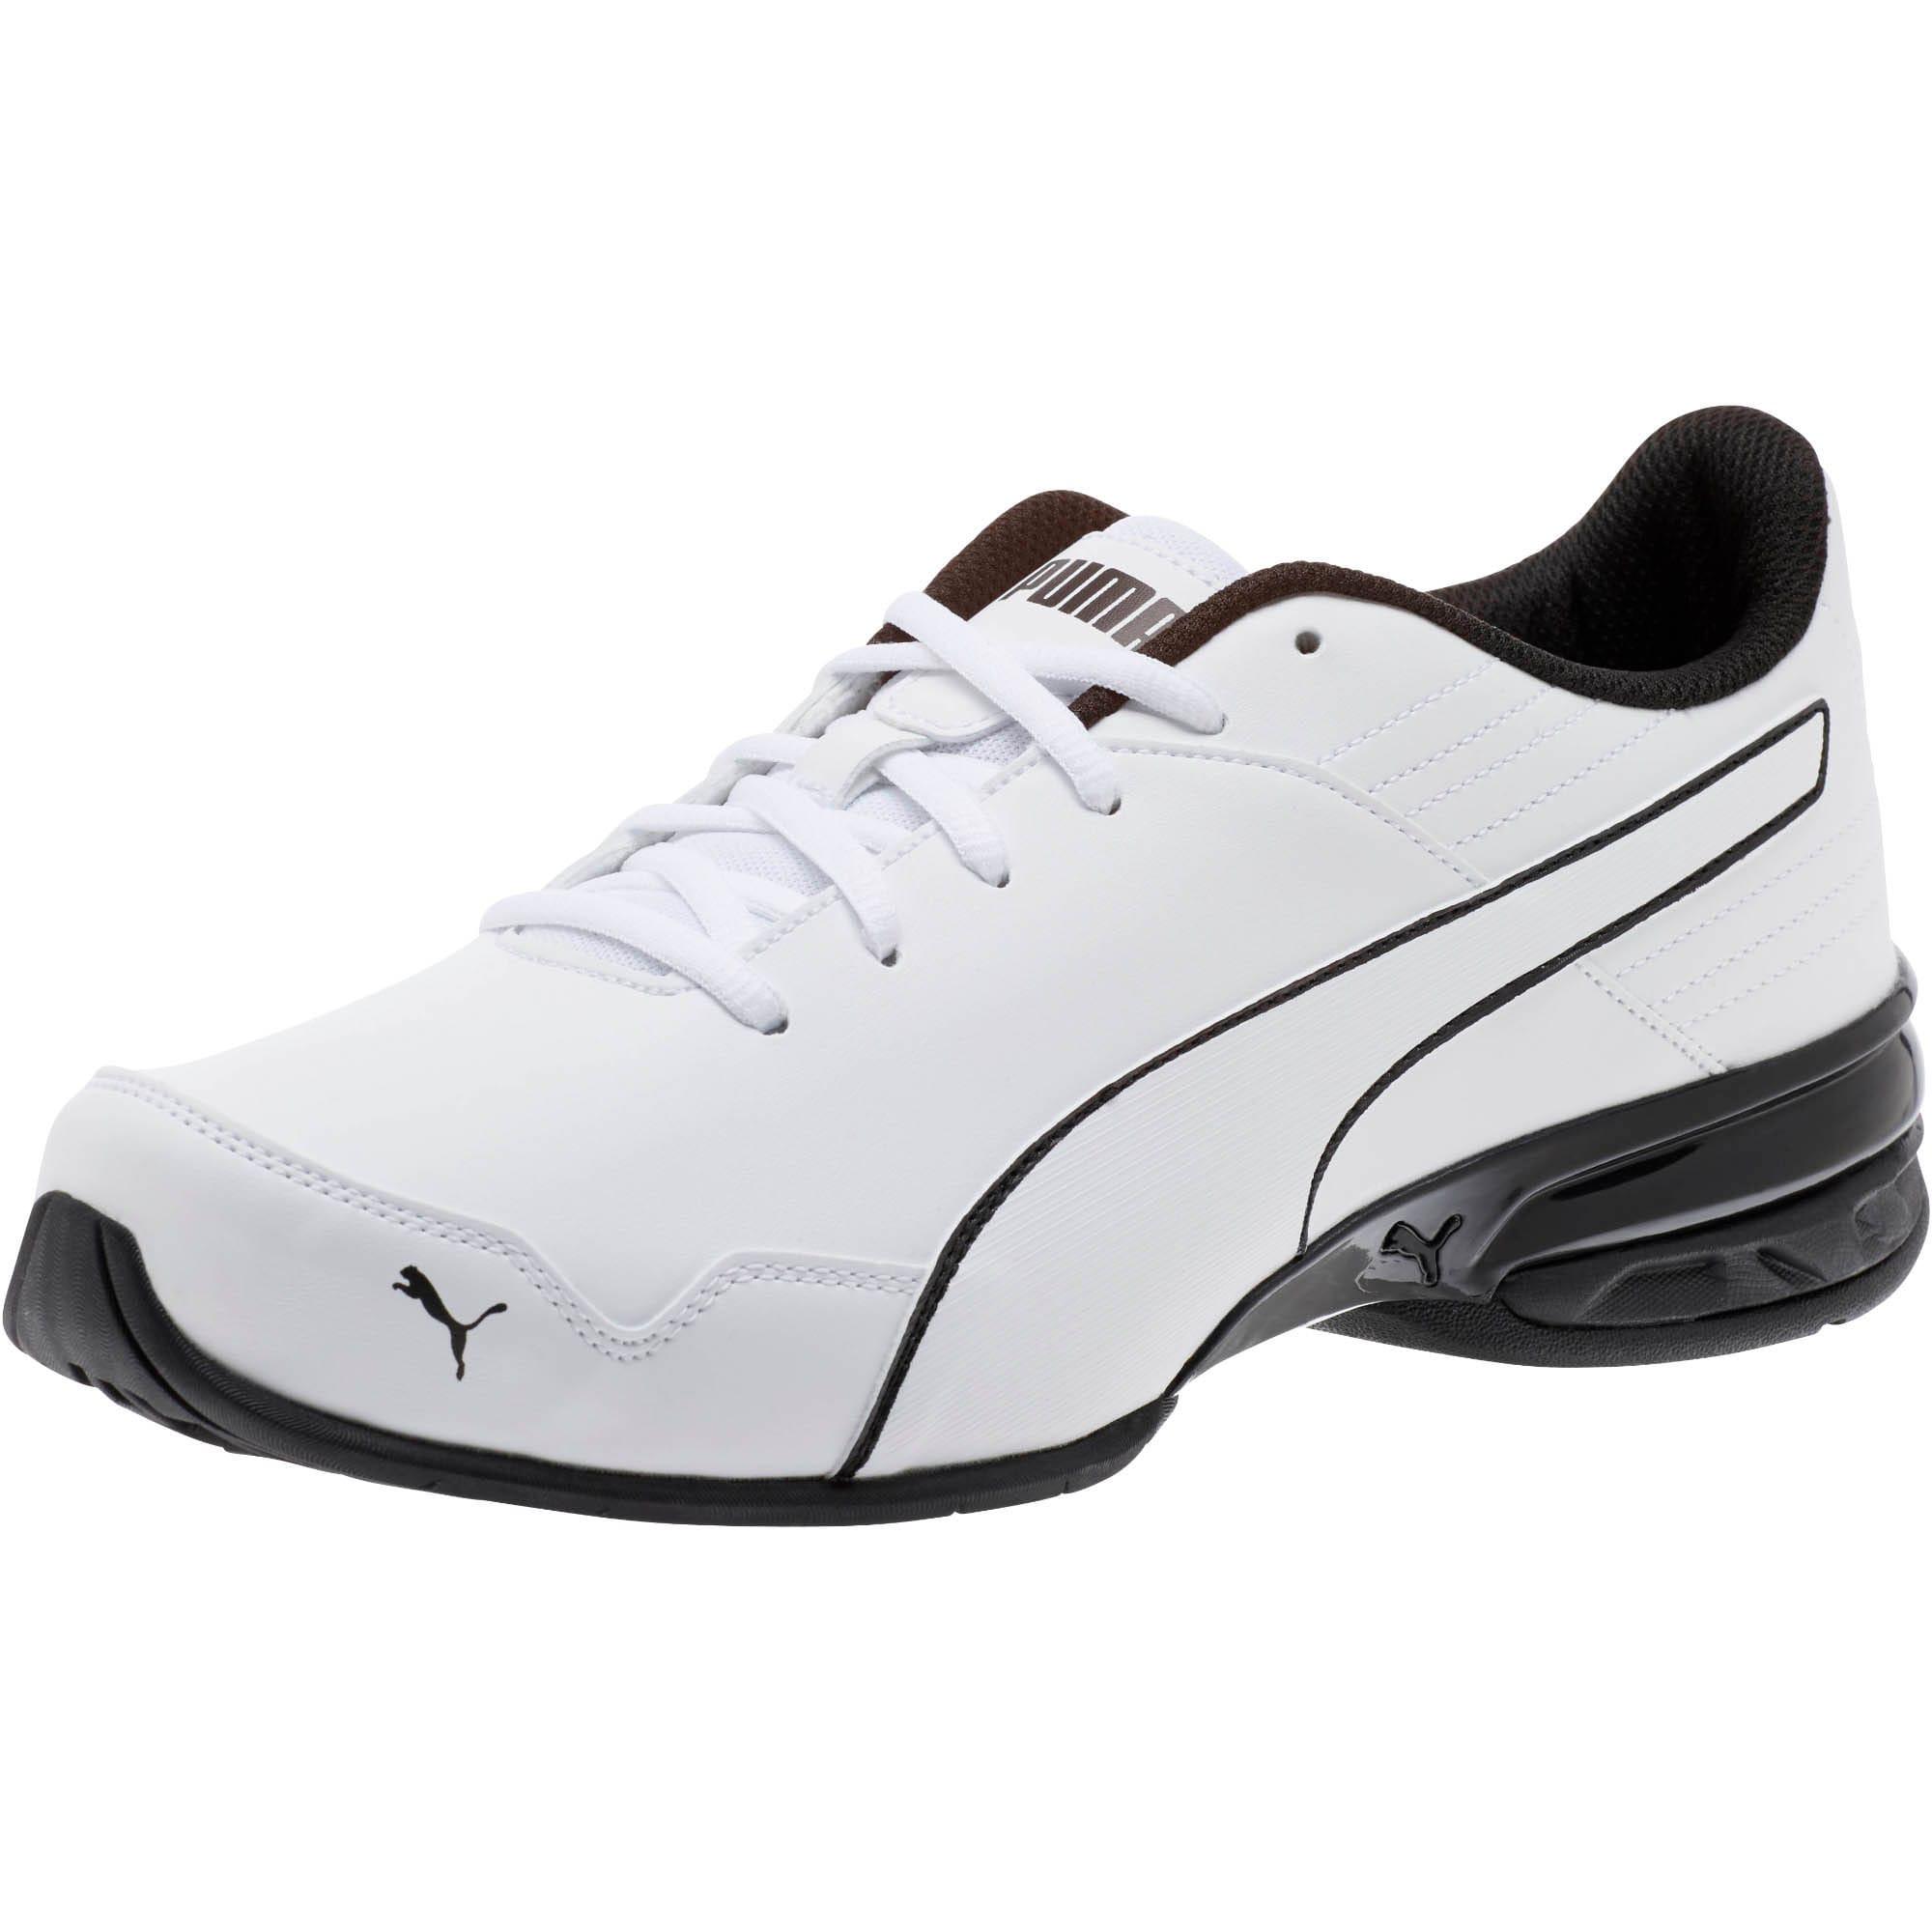 Thumbnail 1 of Super Levitate Men's Running Shoes, Puma White-Puma Black, medium